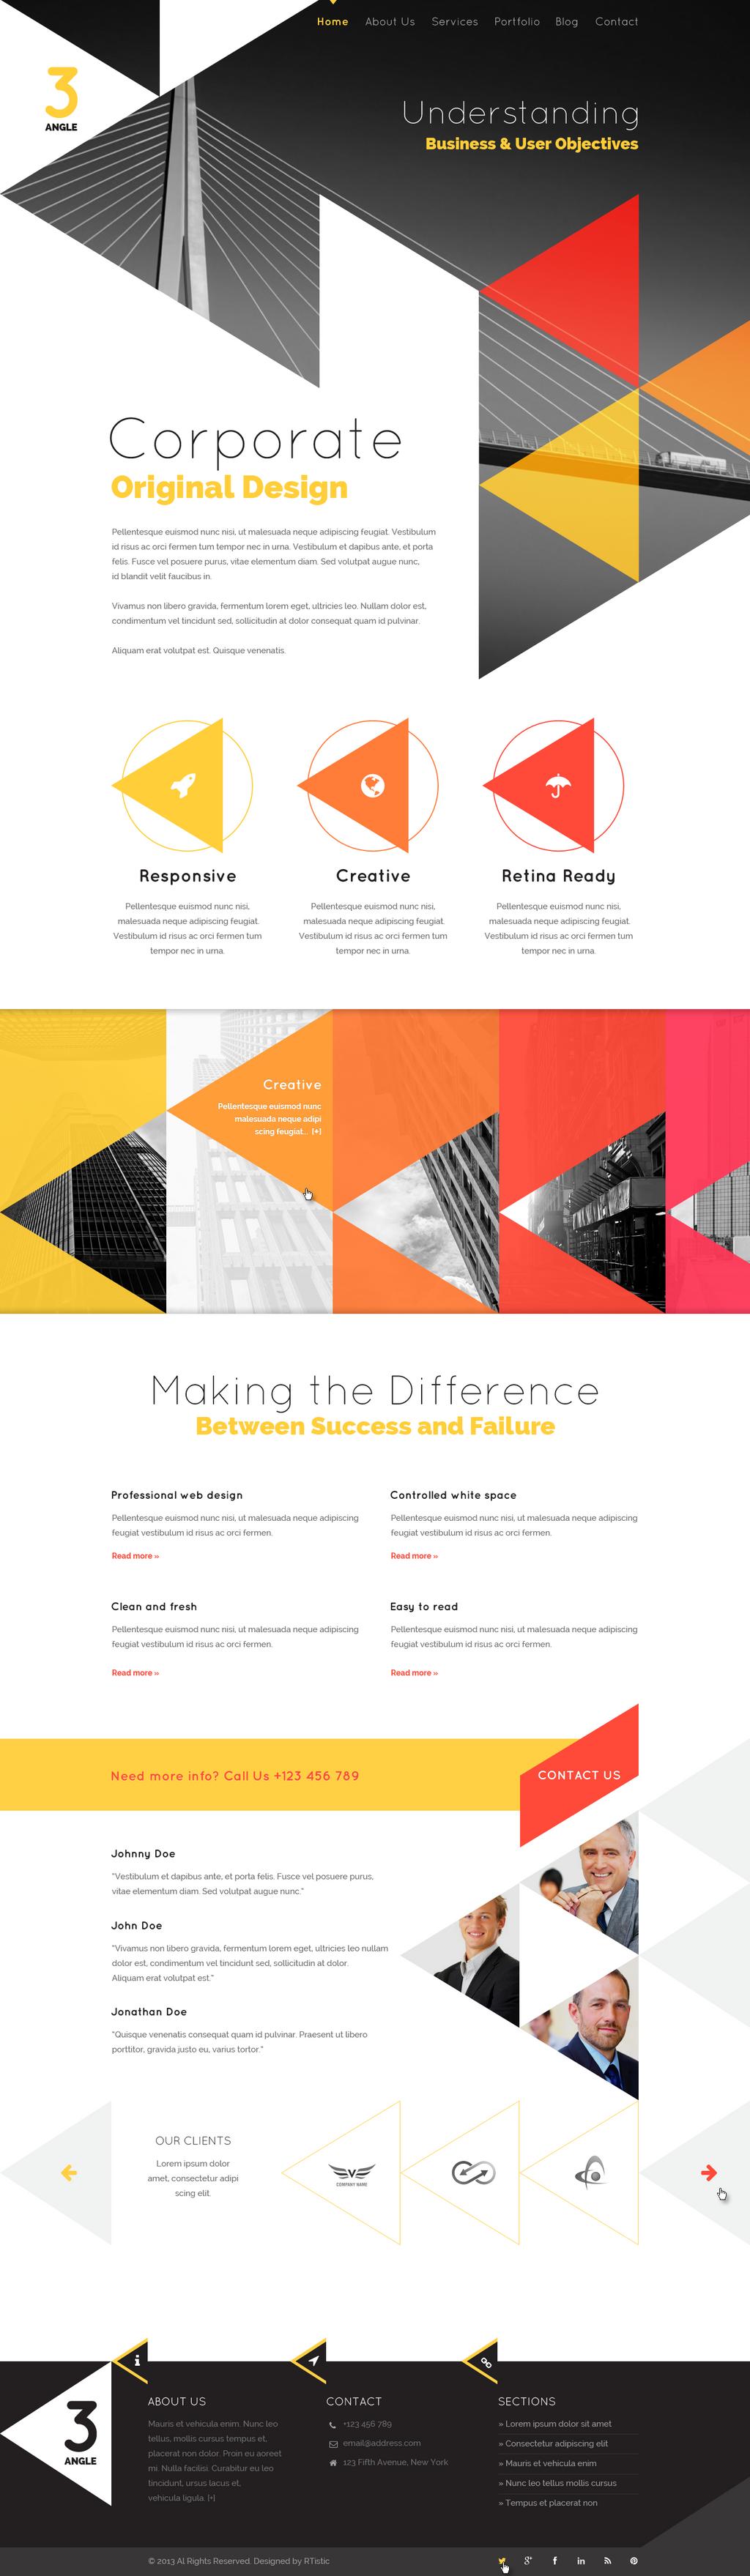 3Angle - Agency Creative HTML Template by sandracz